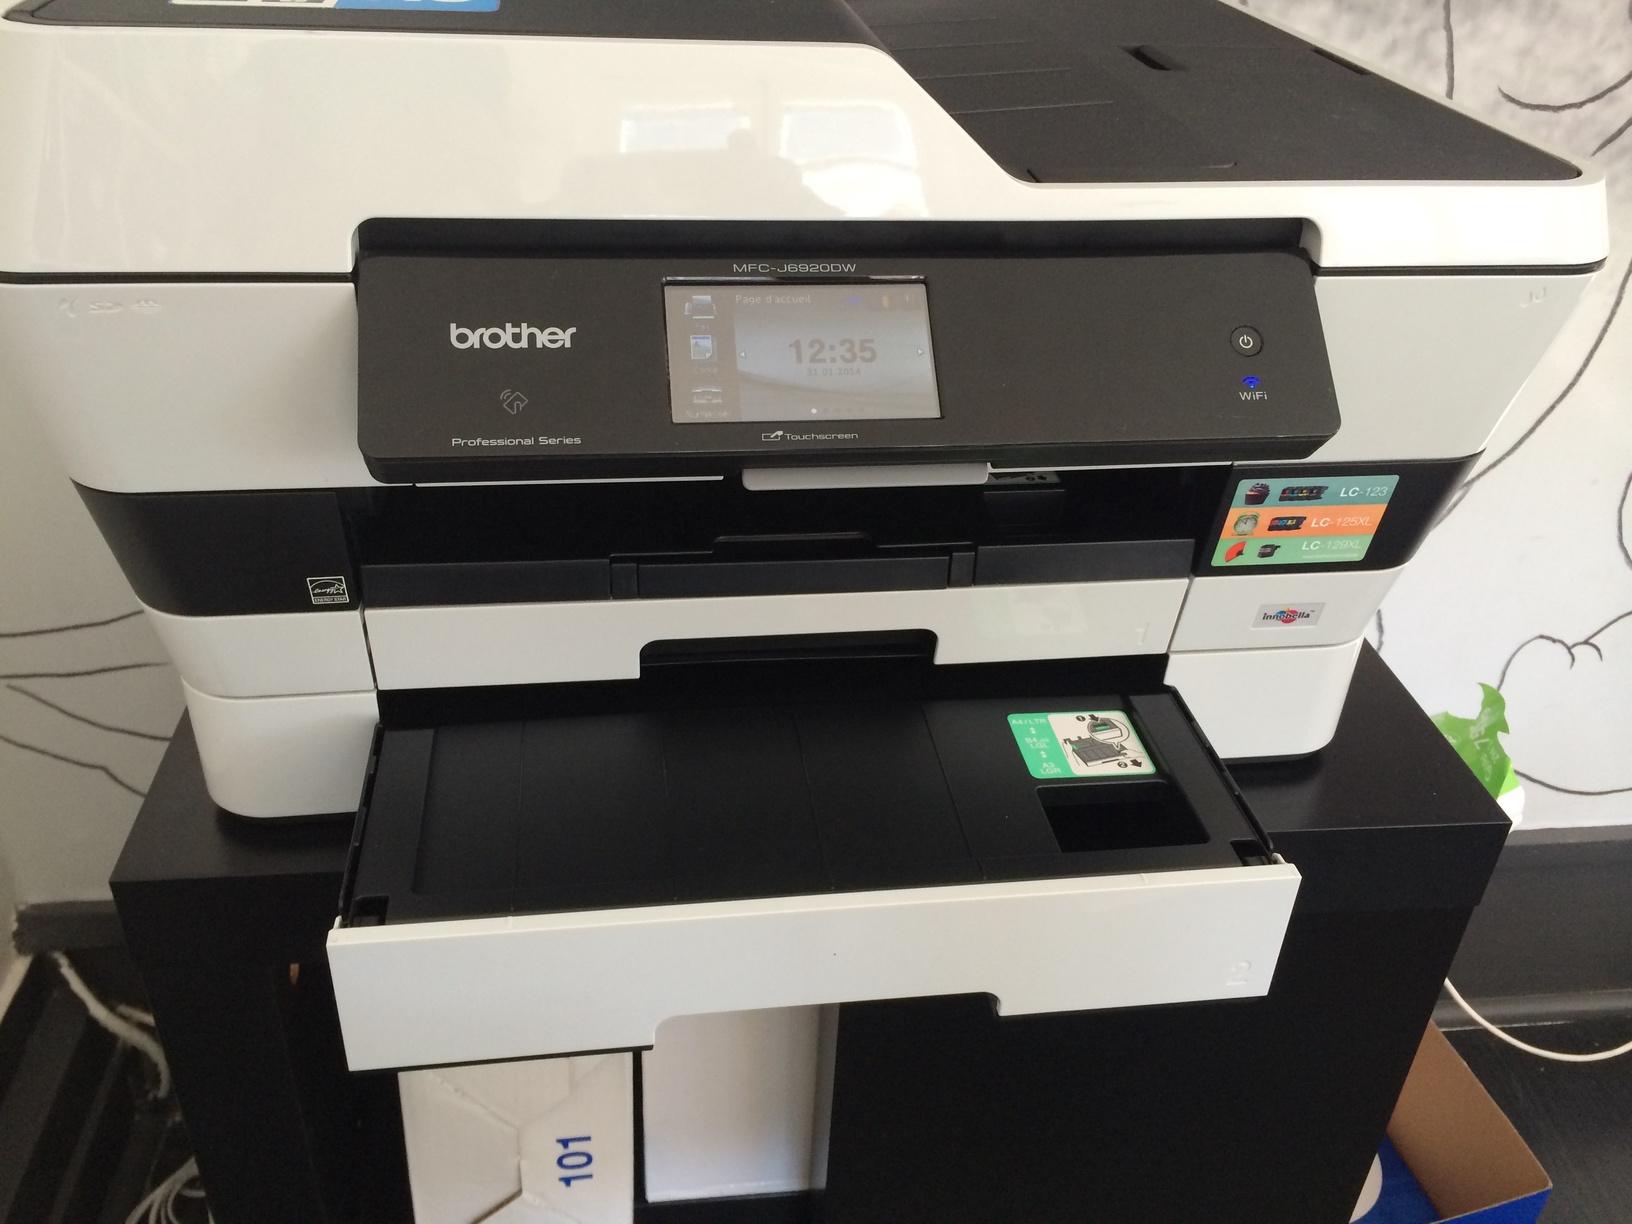 Brother imprimante mac